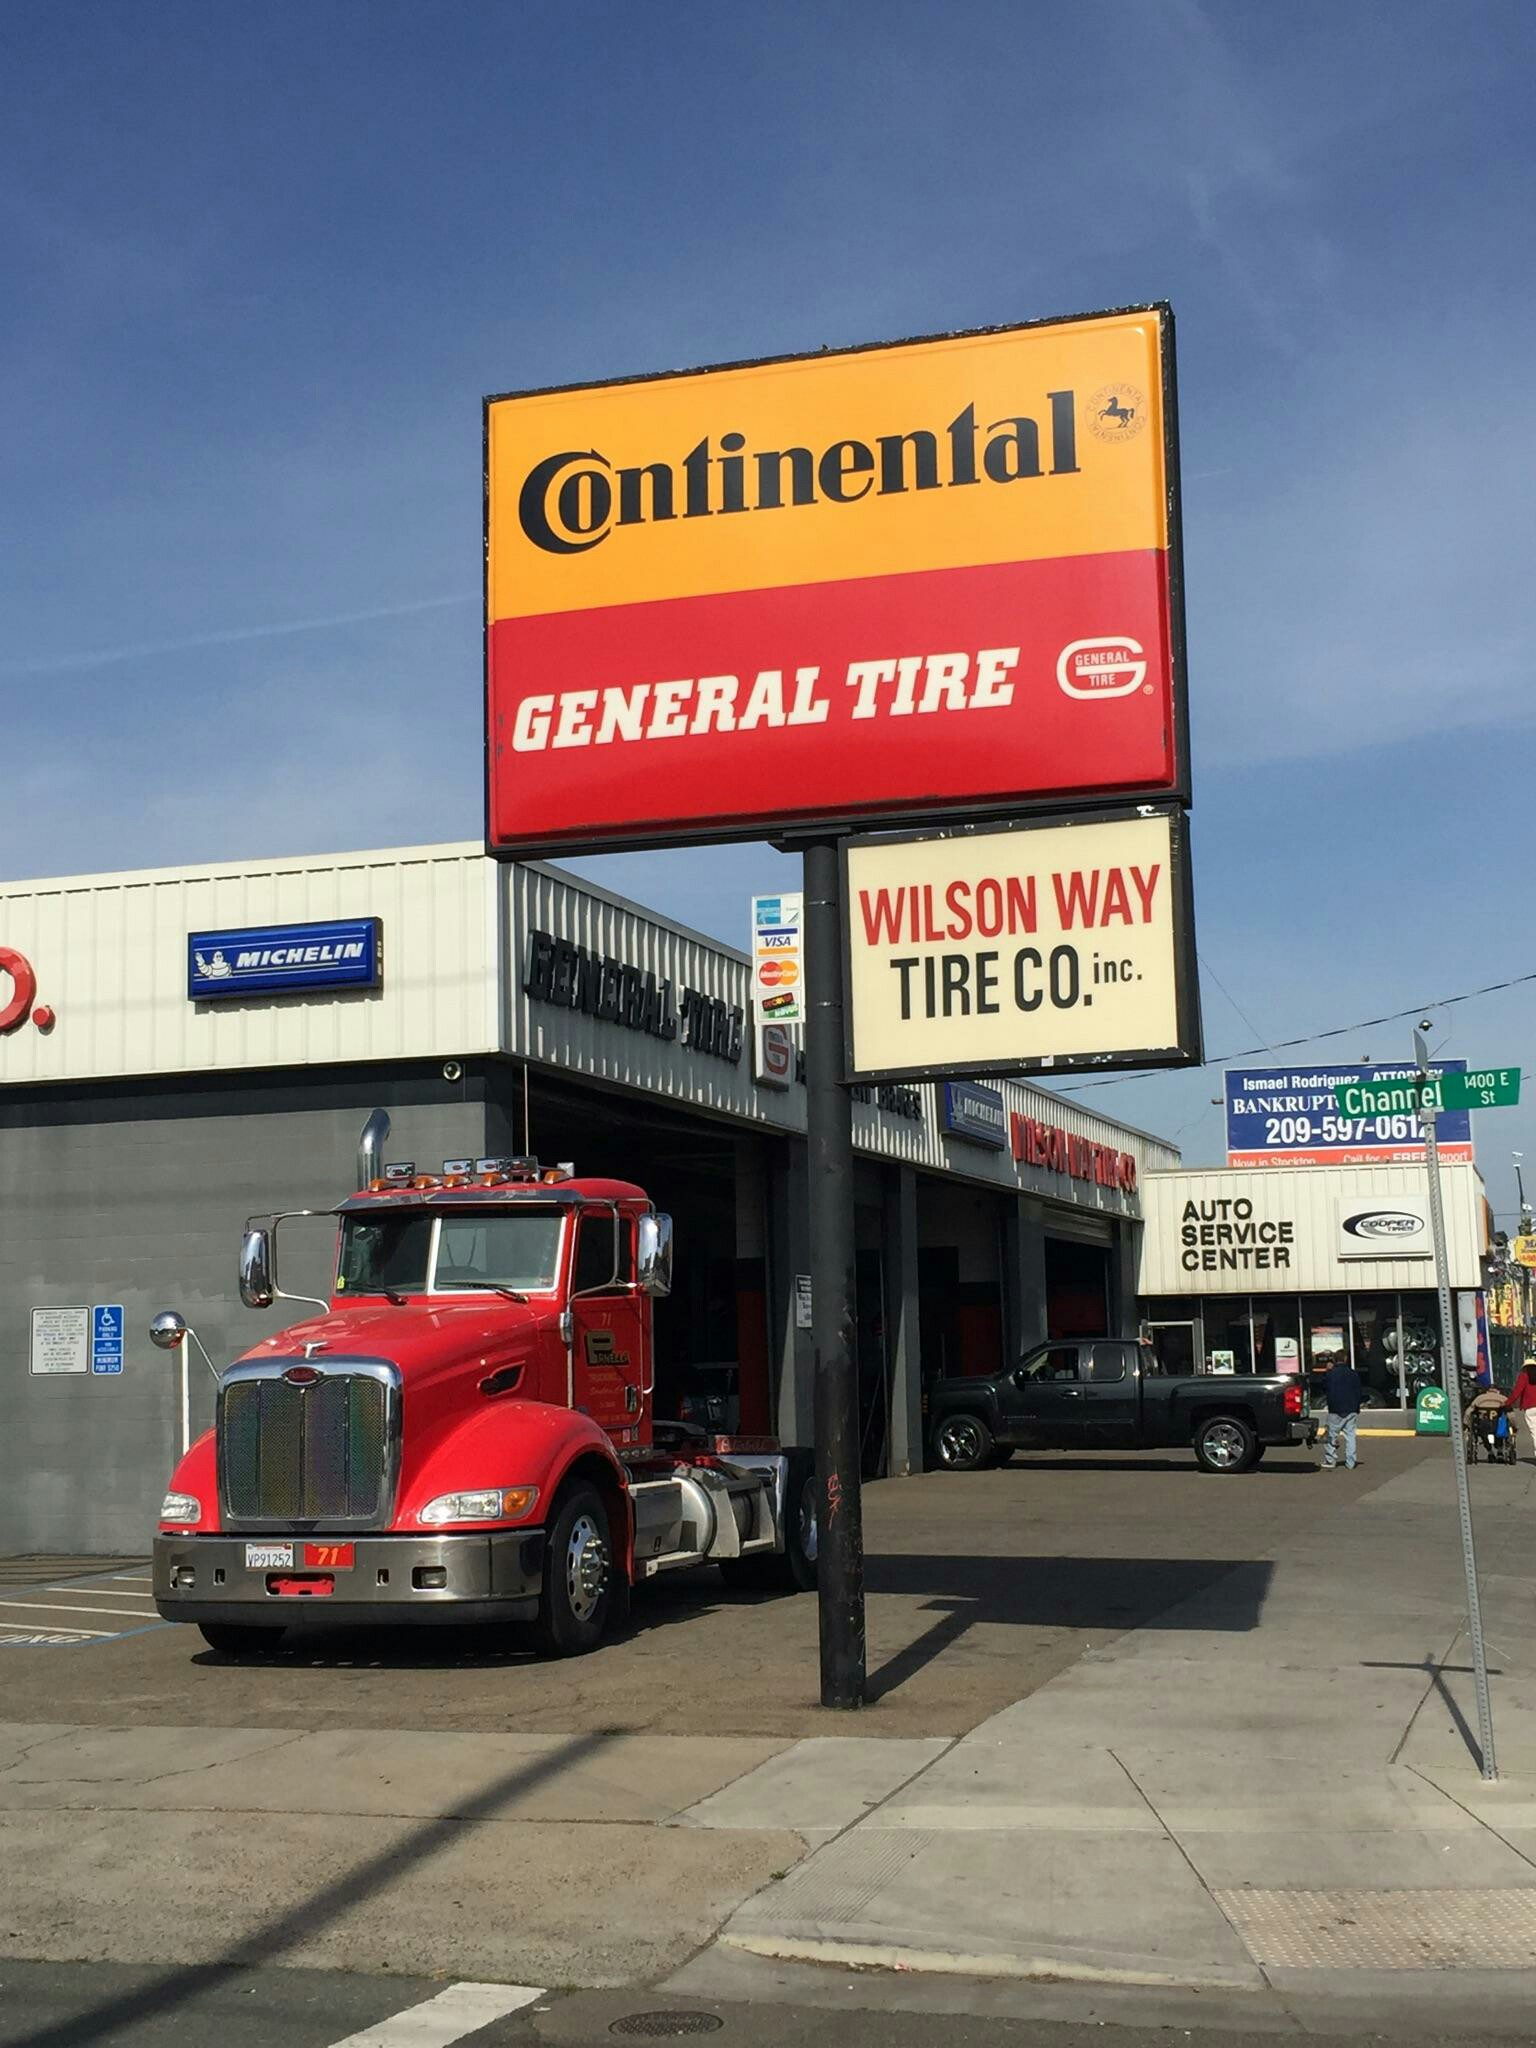 Wilson Way Tire U S Tire Sales 221 N Wilson Way Stockton CA